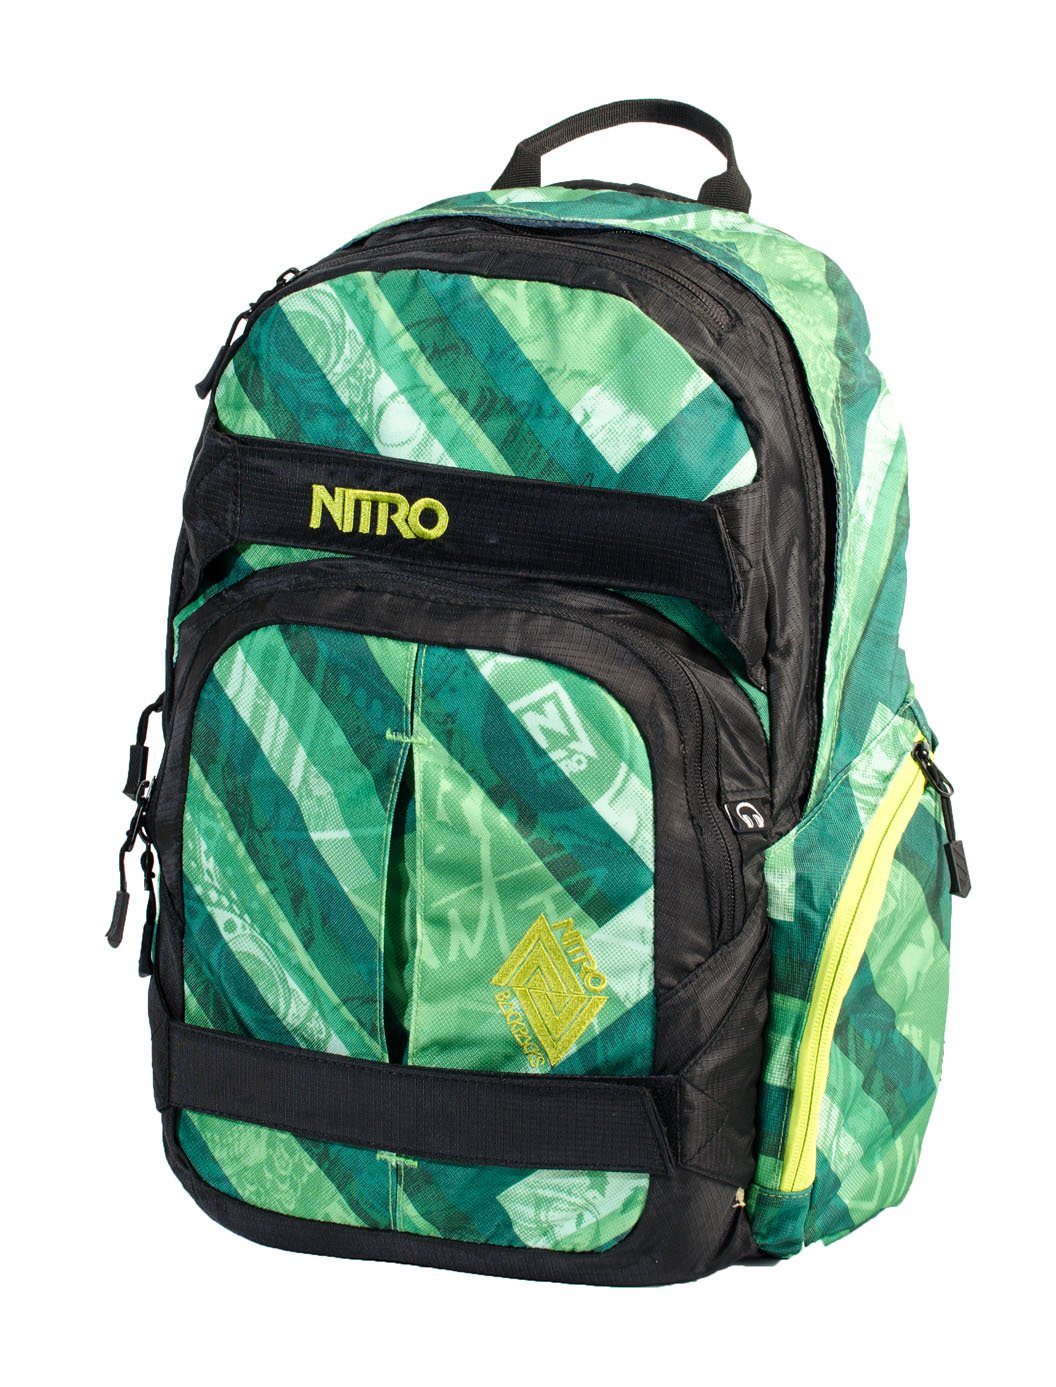 Nitro Rucksack Drifter, bleach, 27 liters, 1121877470 Nitro Snowboards